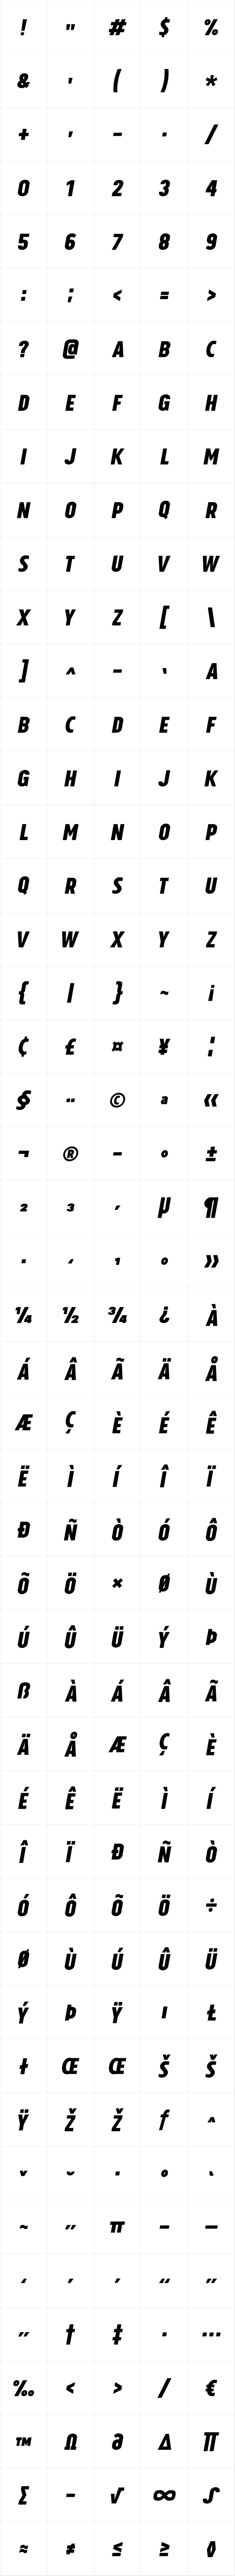 Tolyer Bold no2 Oblique